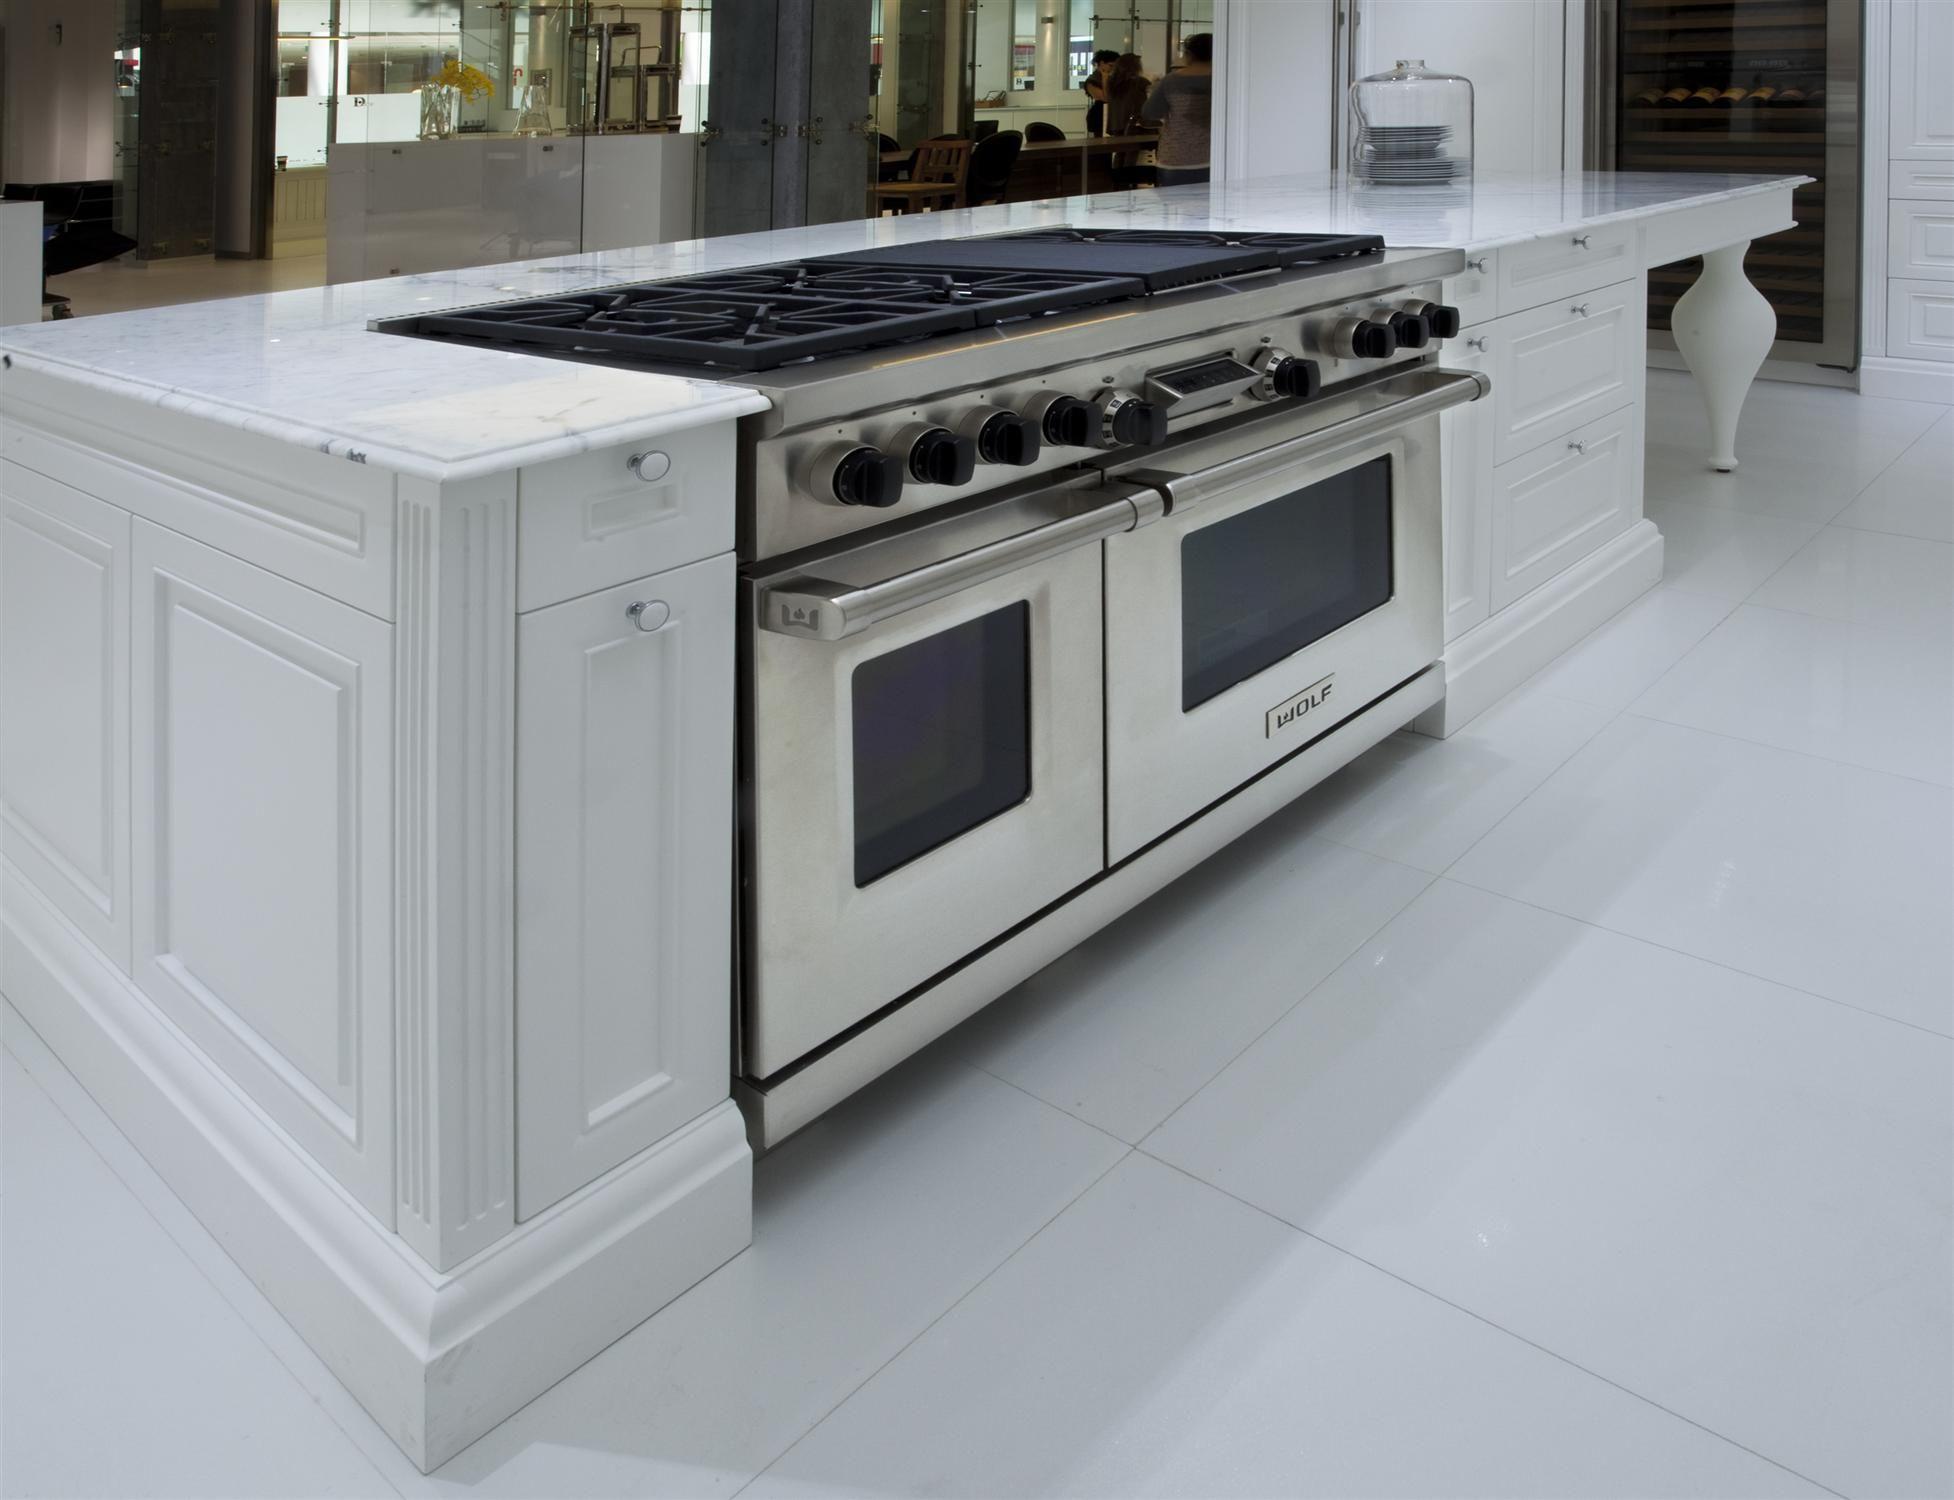 Pin by decor Kitchens מטבחי דקור on storage solutions פתרונות אחסון ...